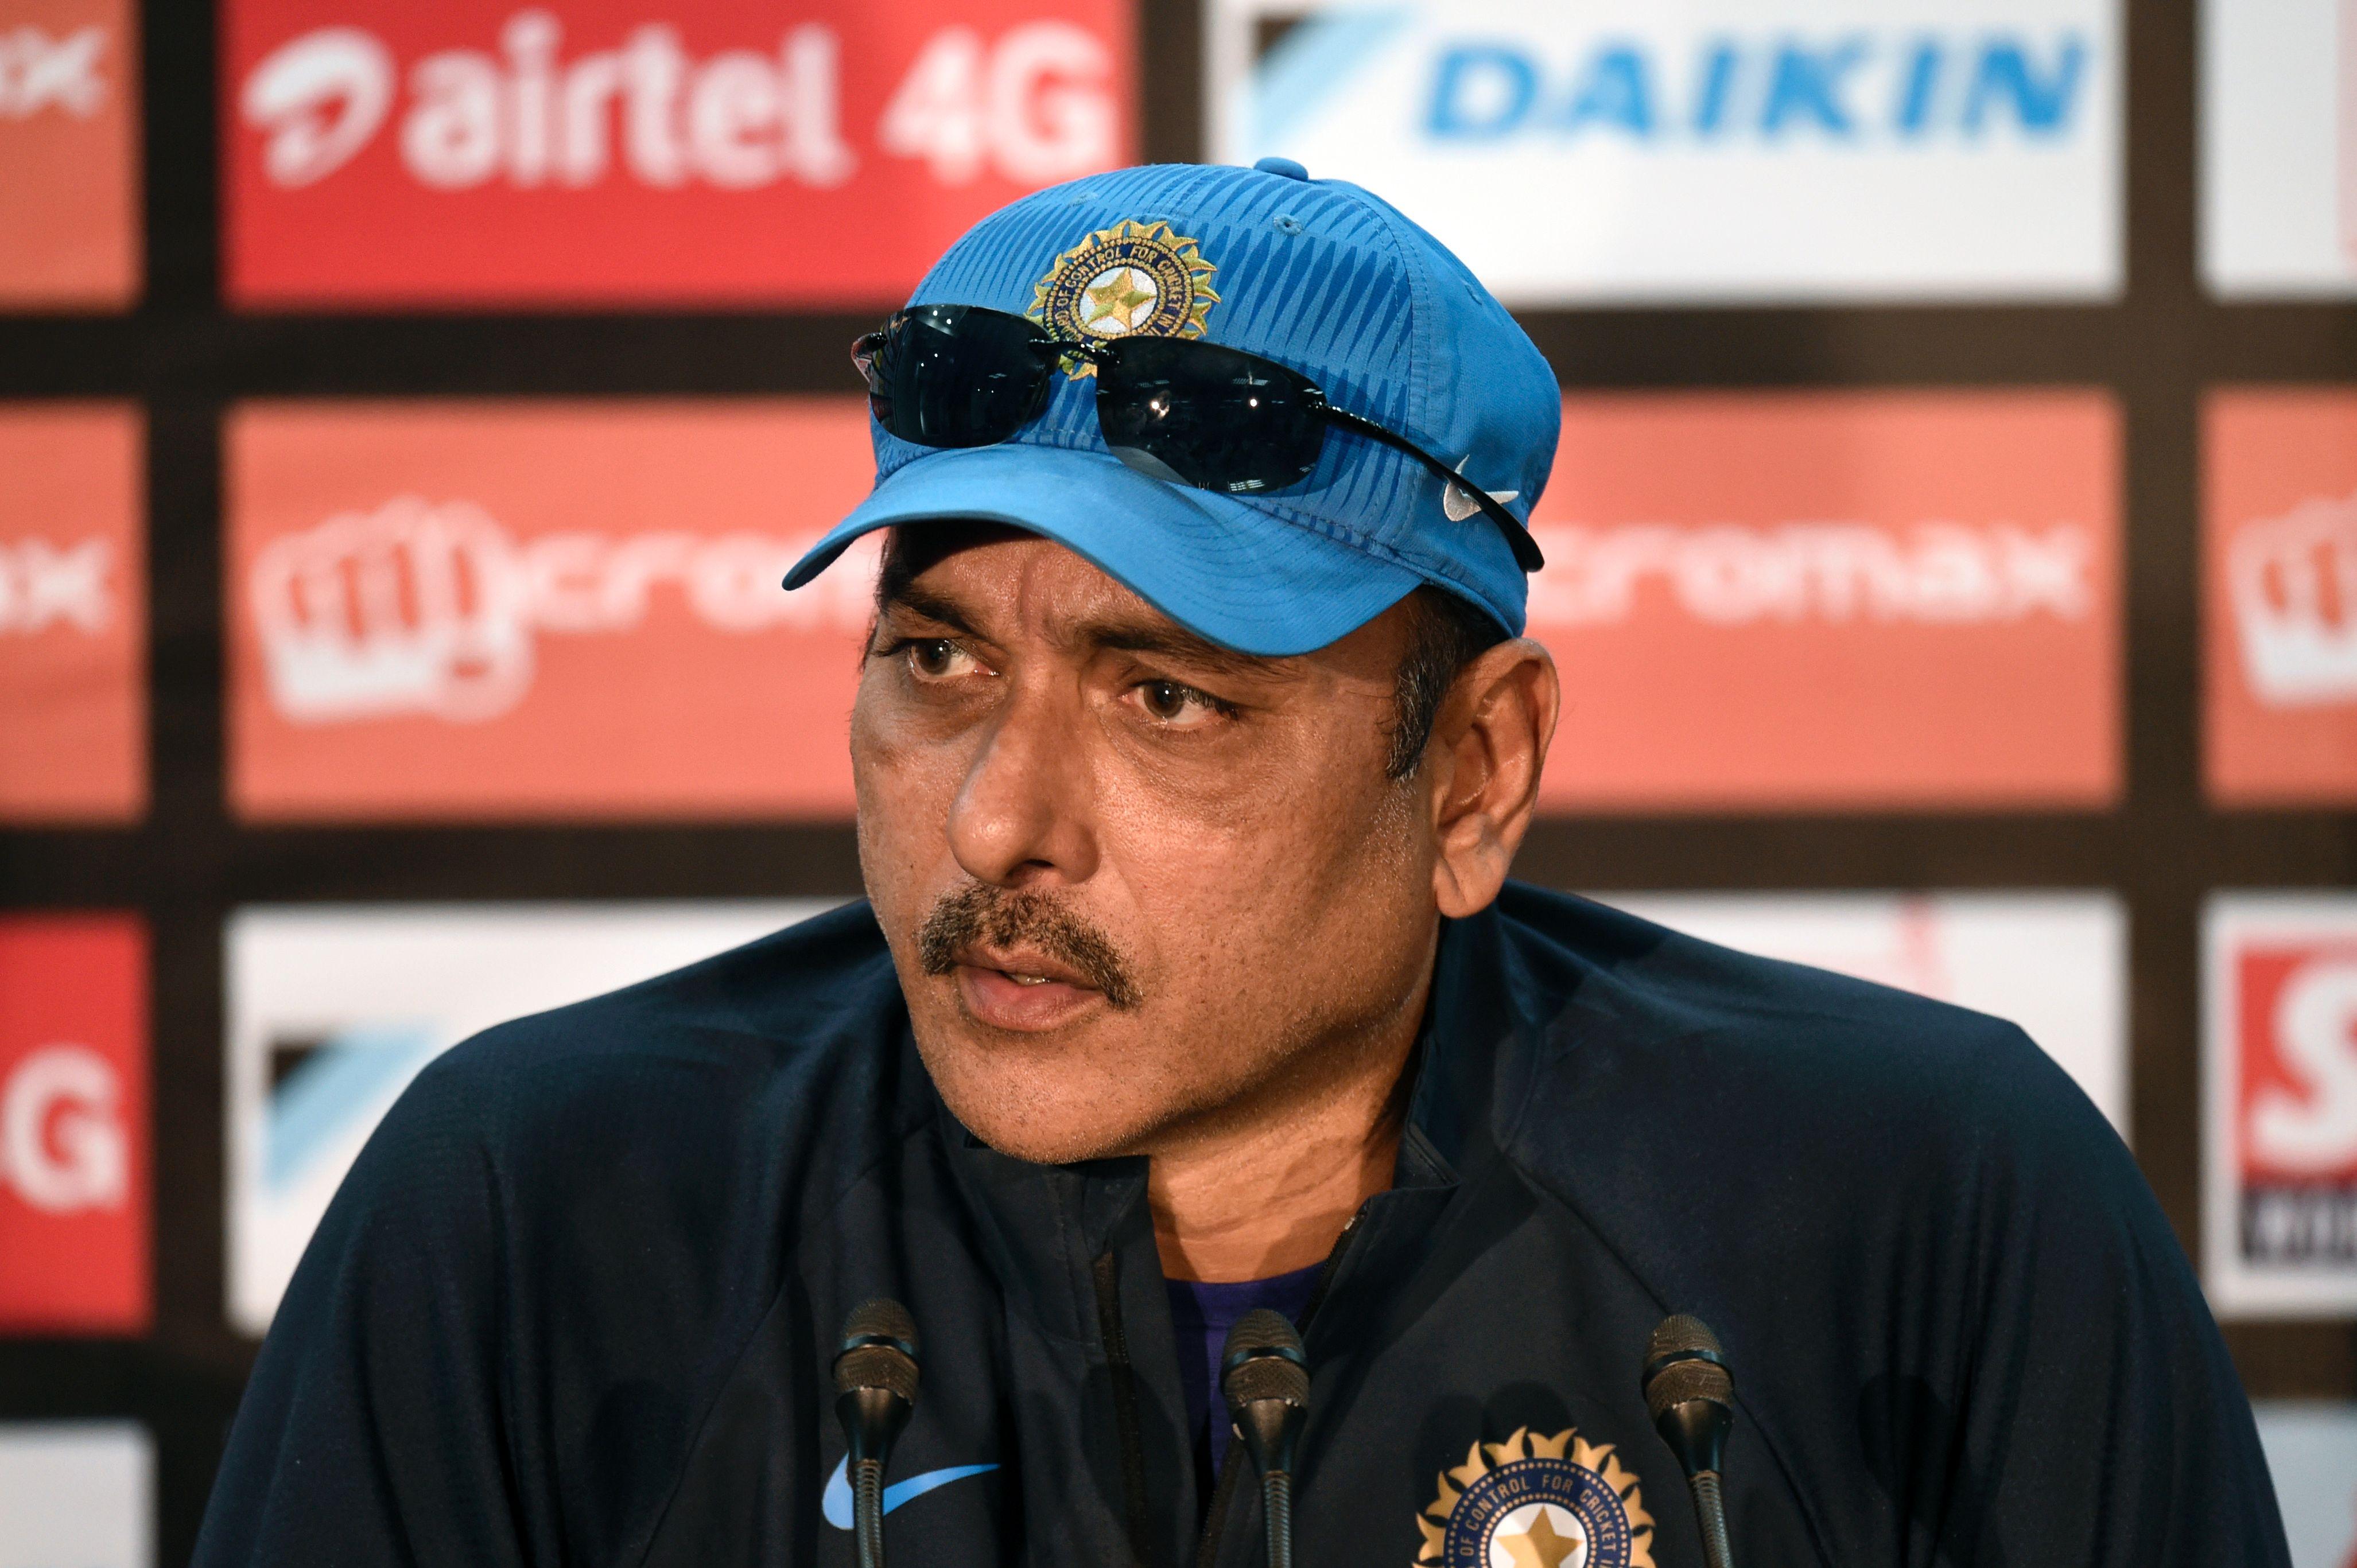 Indian cricket coach Ravi Shastri  (MUNIR UZ ZAMAN/AFP/Getty Images)